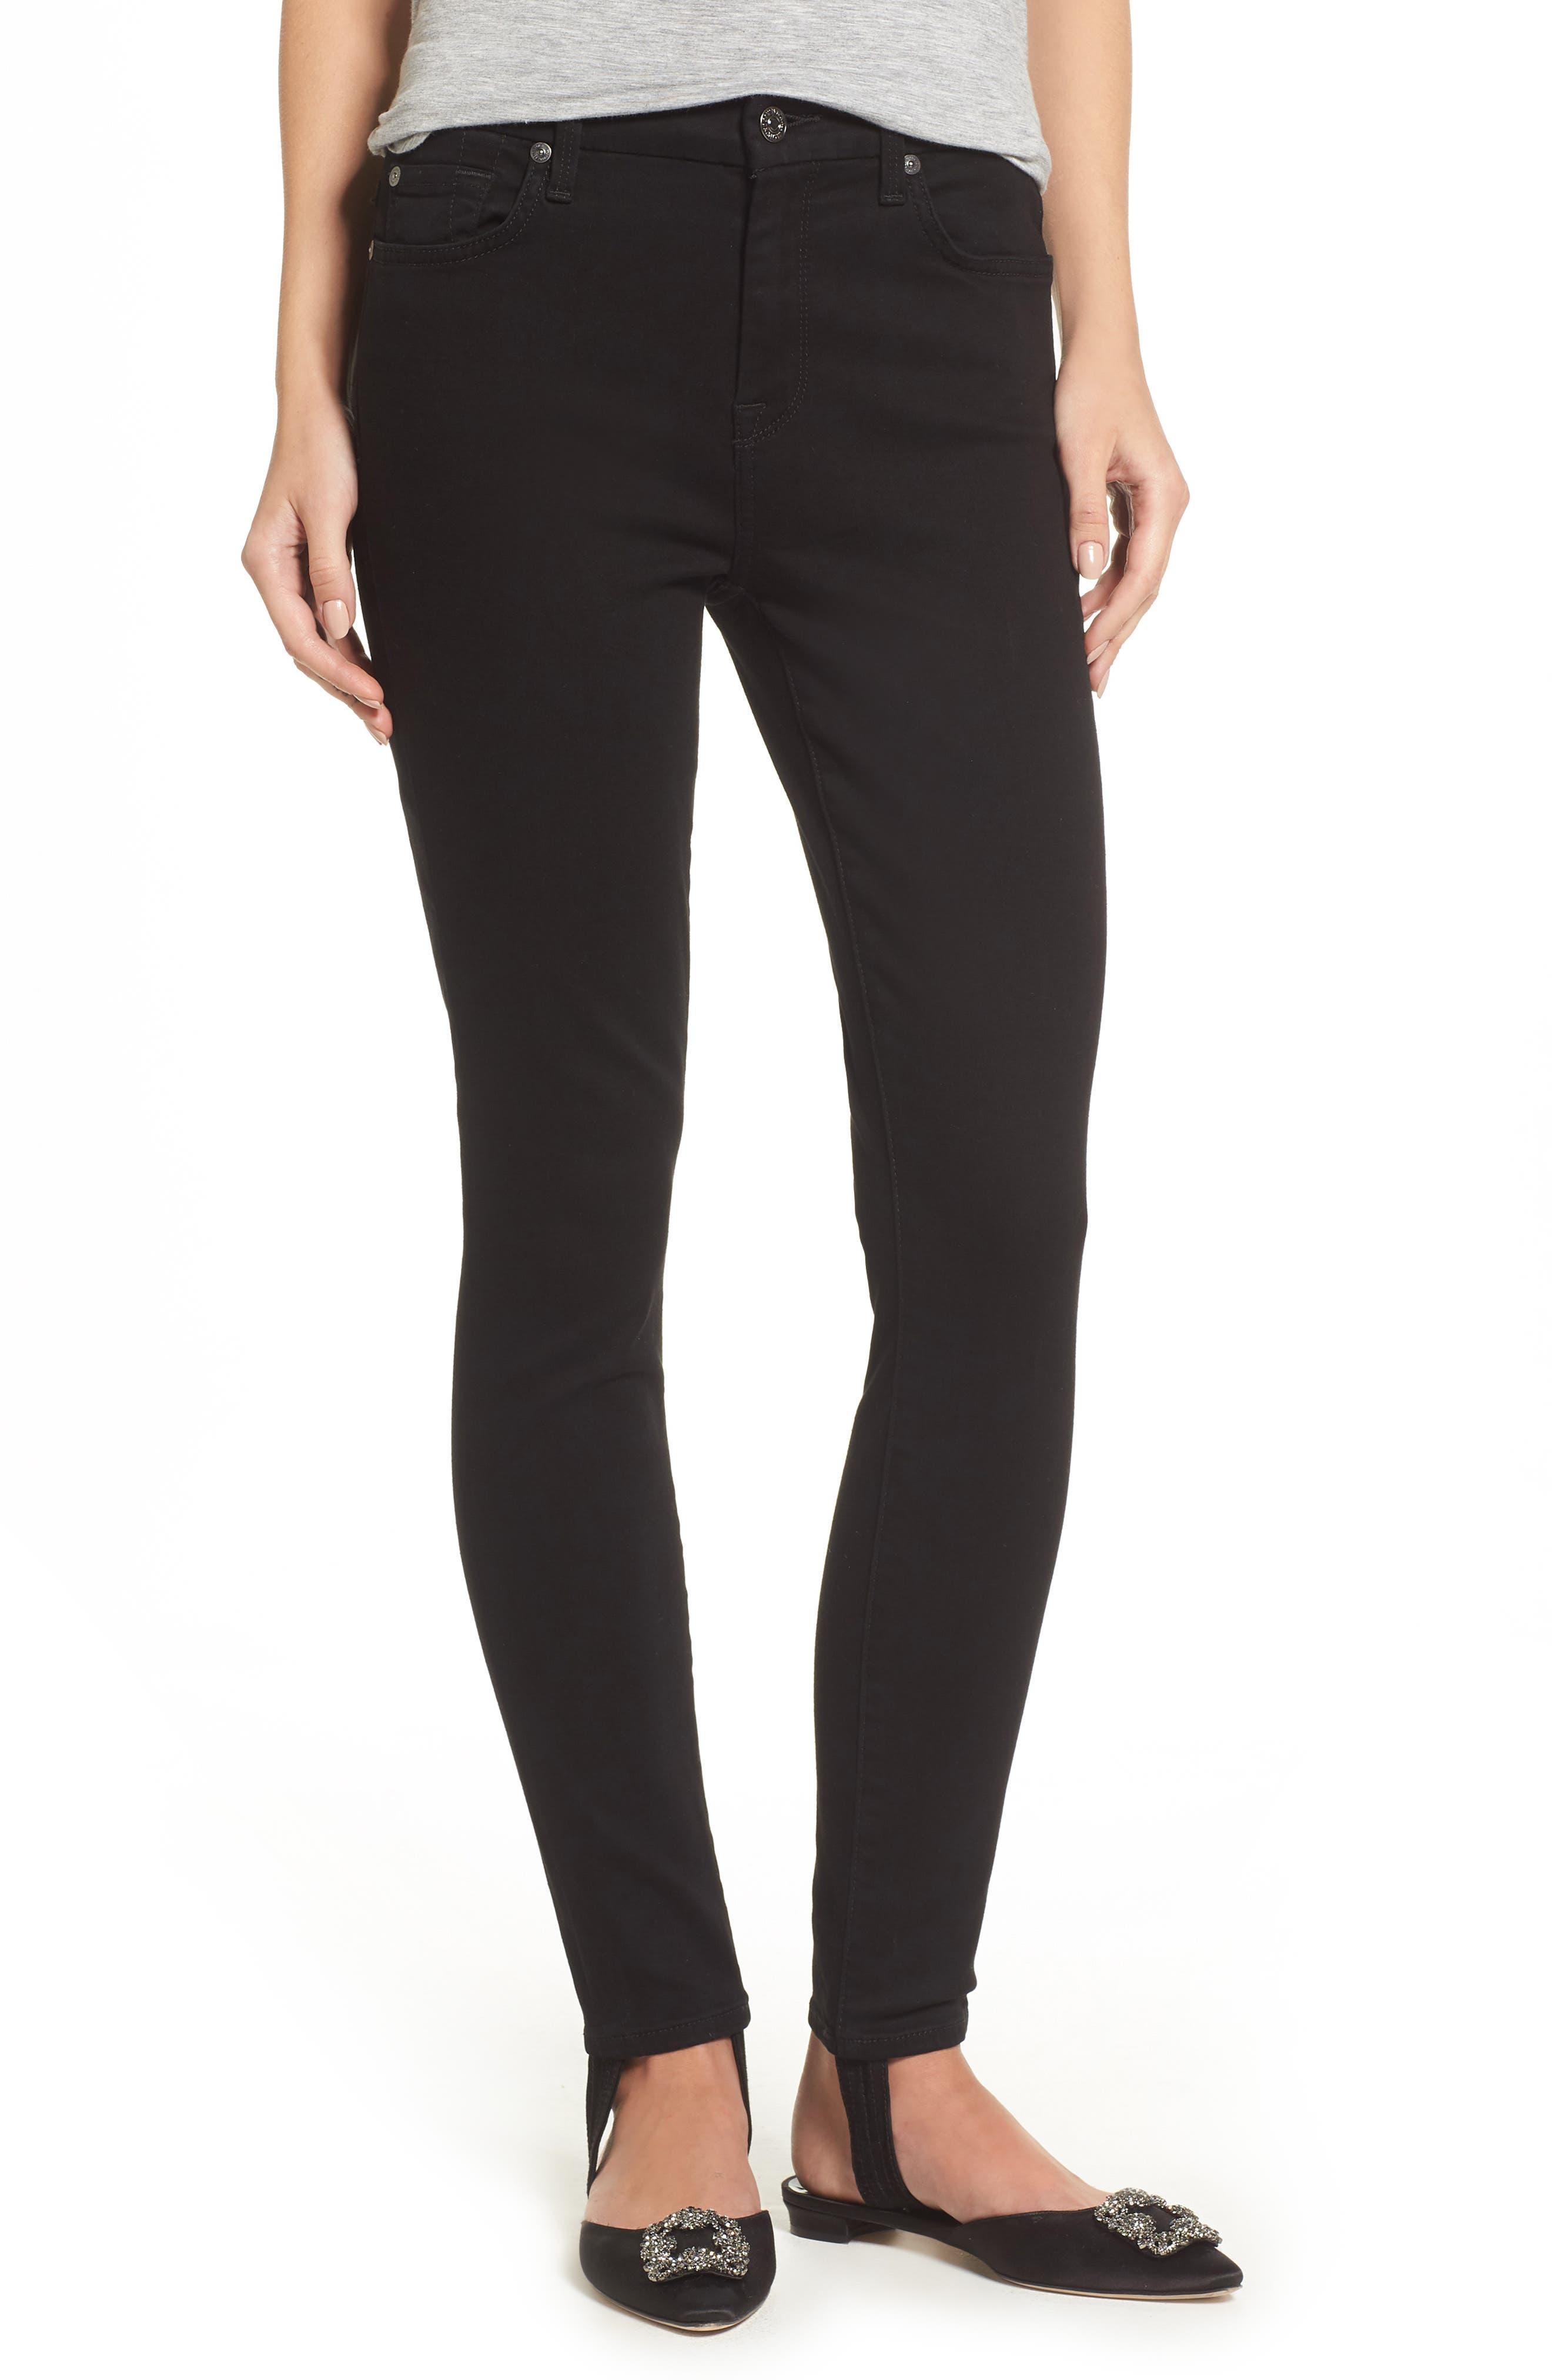 b(air) High Waist Ankle Skinny Stirrup Jeans,                         Main,                         color, 004